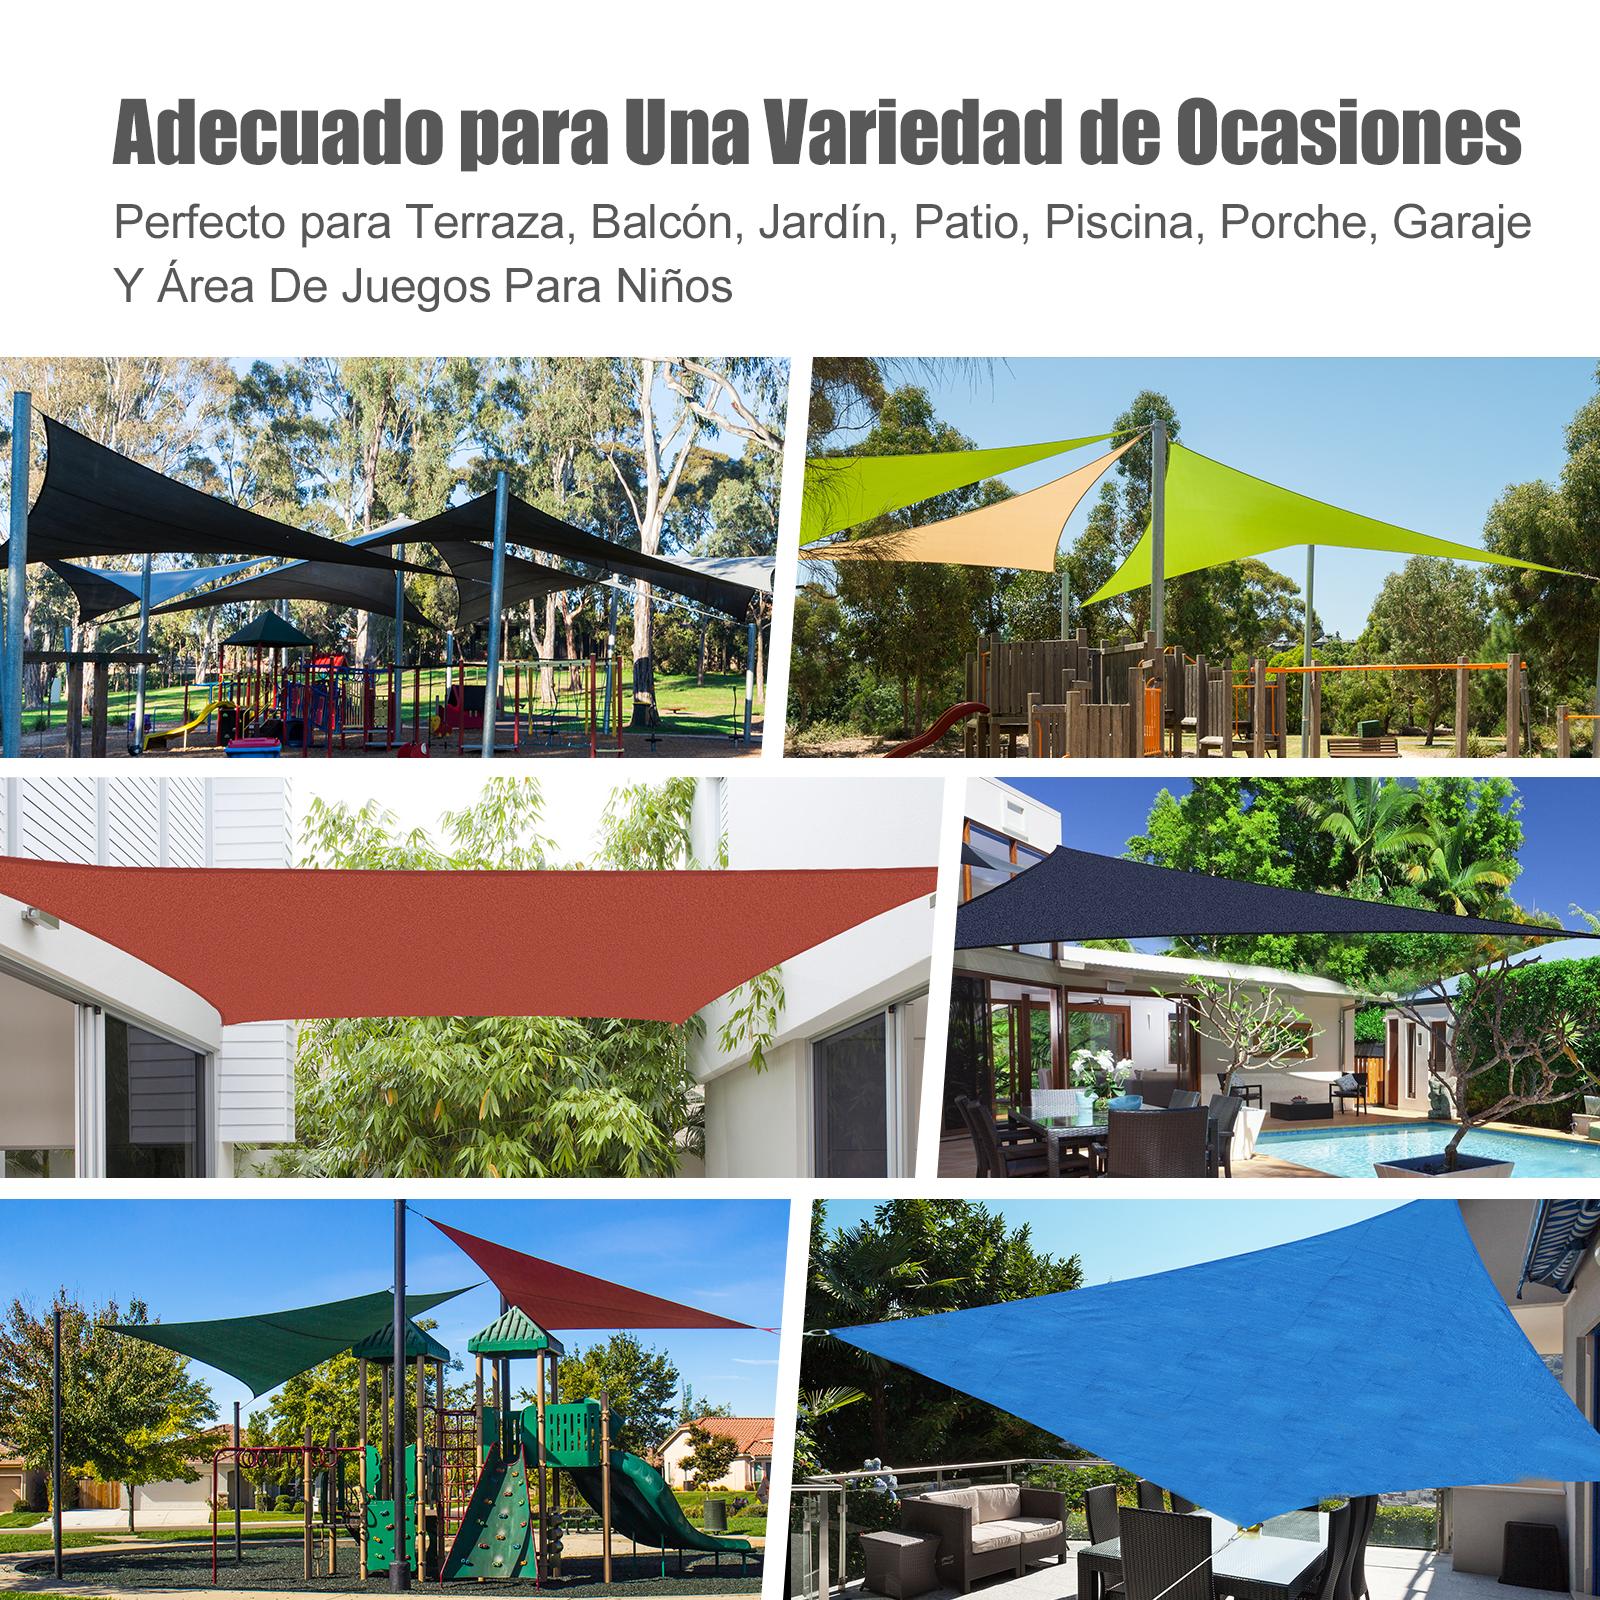 Toldo-de-Vela-Rectangular-para-Jardin-y-Exterior-Repelente-al-Agua-Proteccion-UV miniatura 25